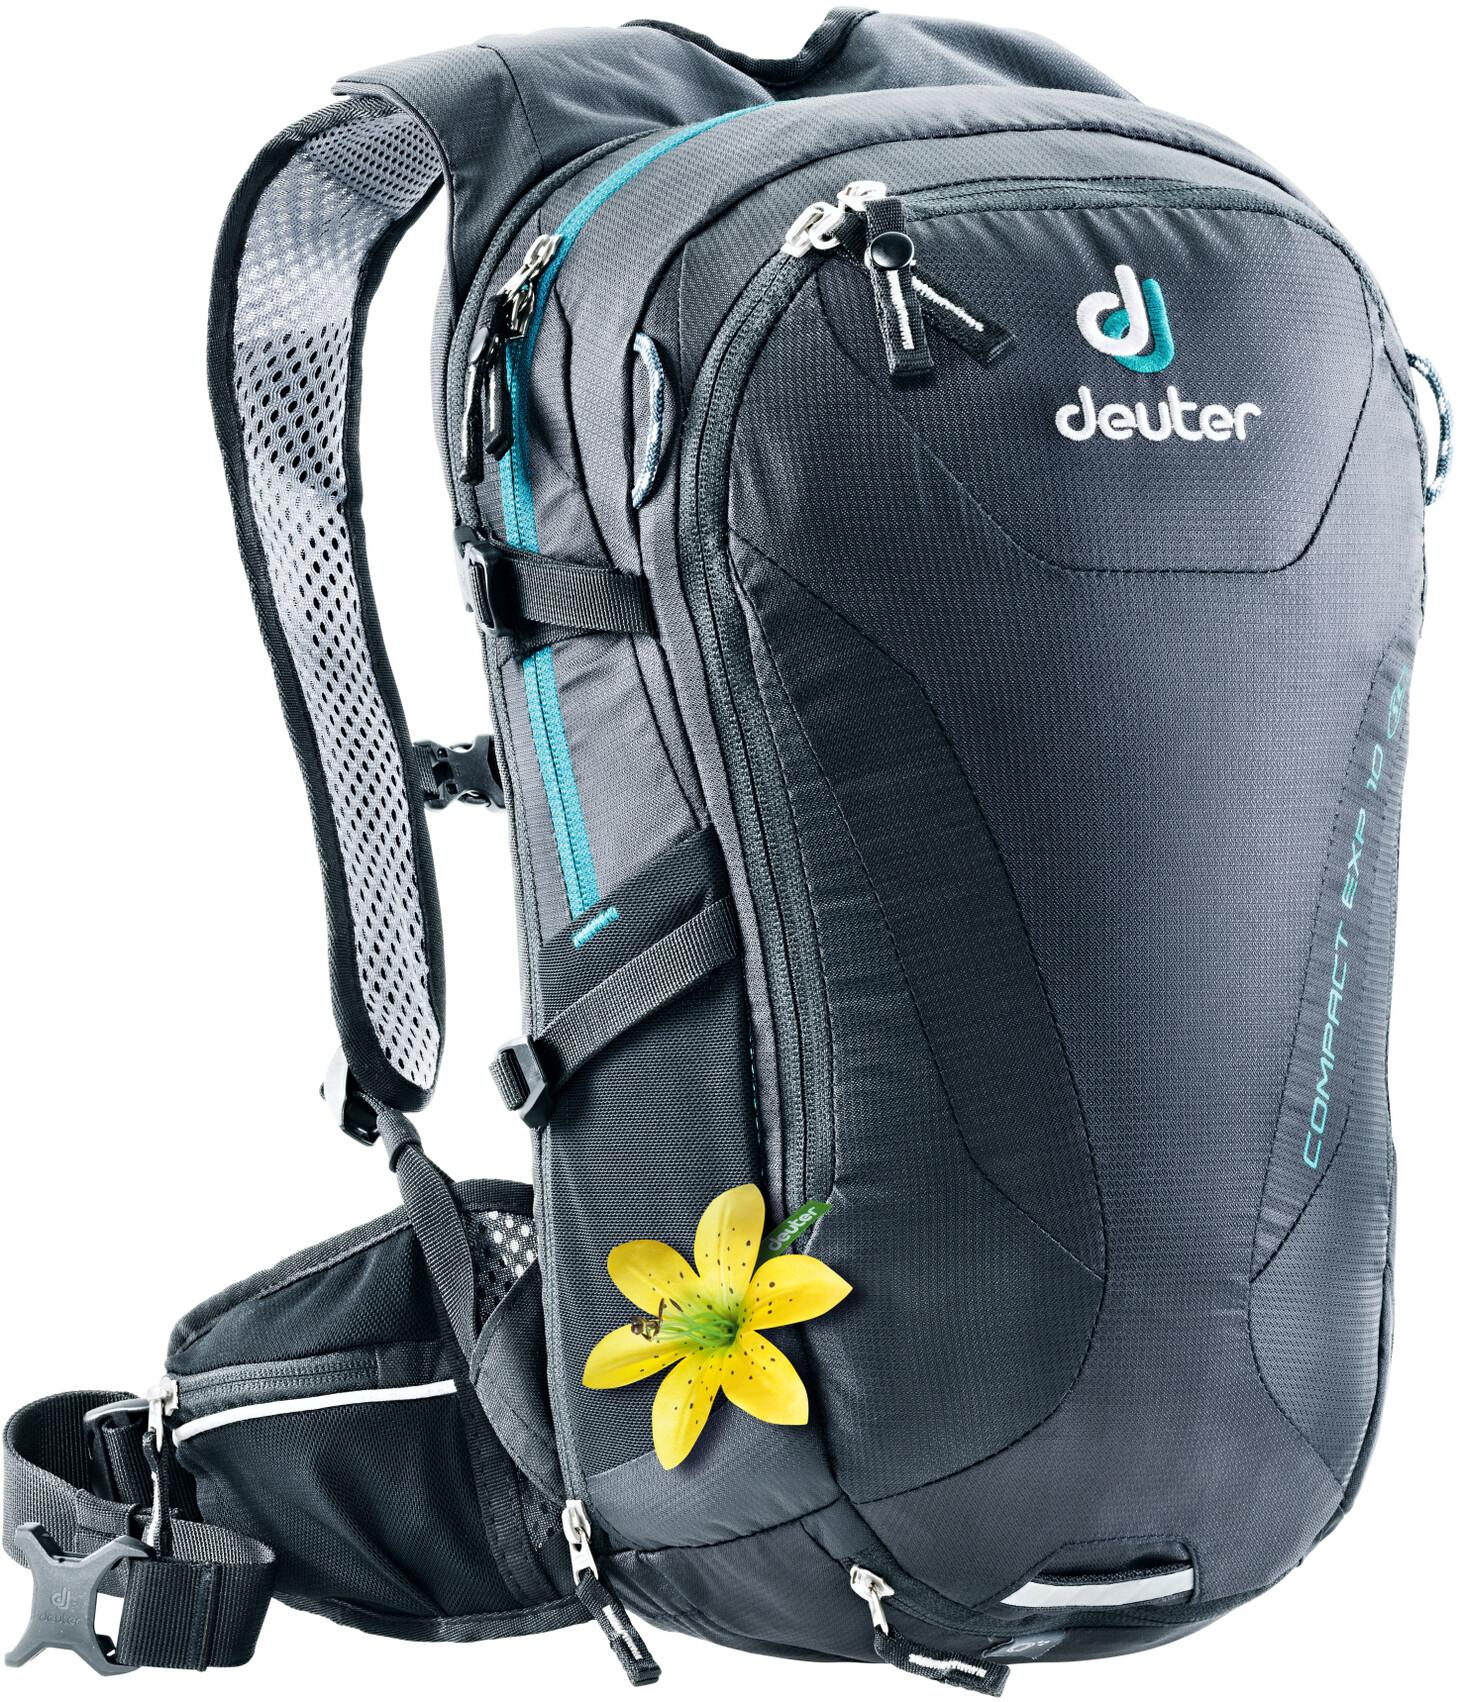 Deuter Compact EXP 10 SL Rygsæk Damer, black (2019)   Travel bags